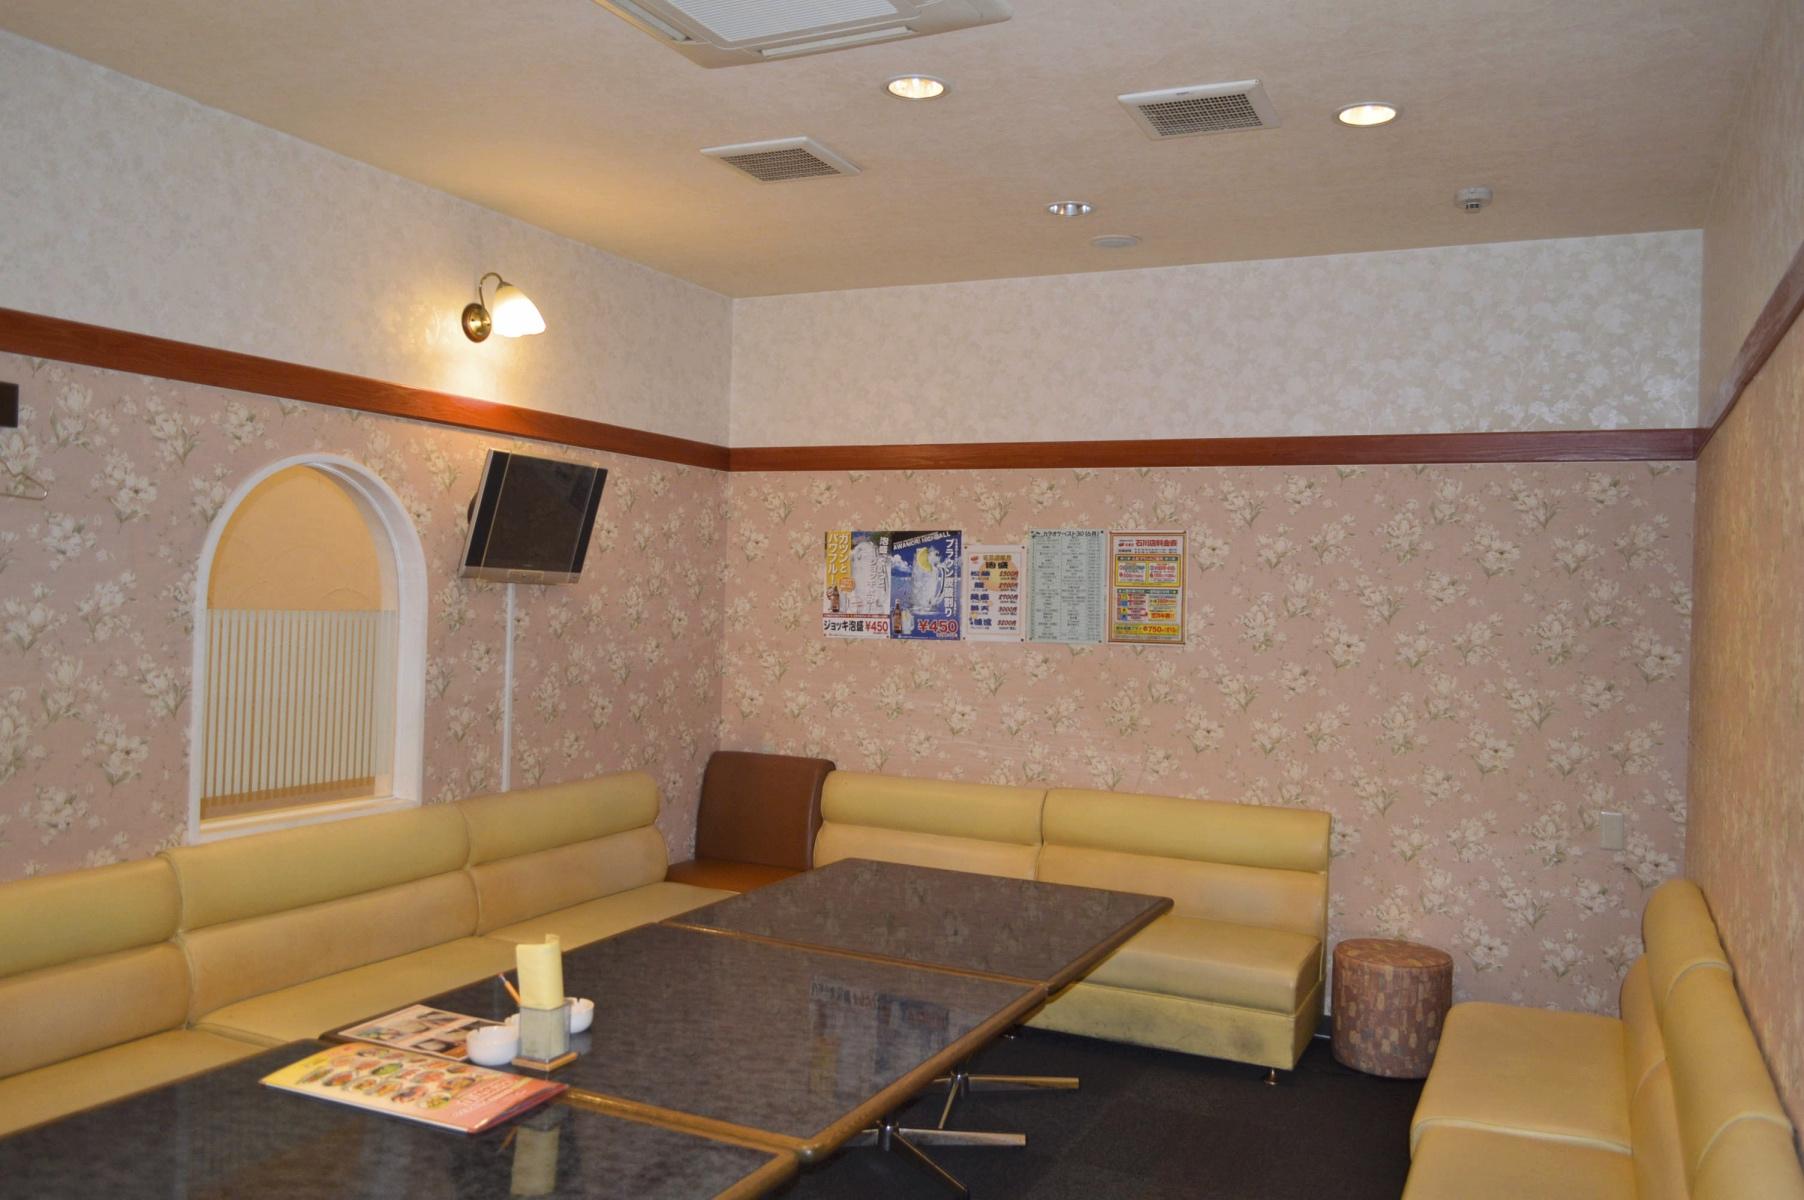 http://ktomato.wp.xdomain.jp/wp-content/uploads/2016/07/ishikawa05.jpg